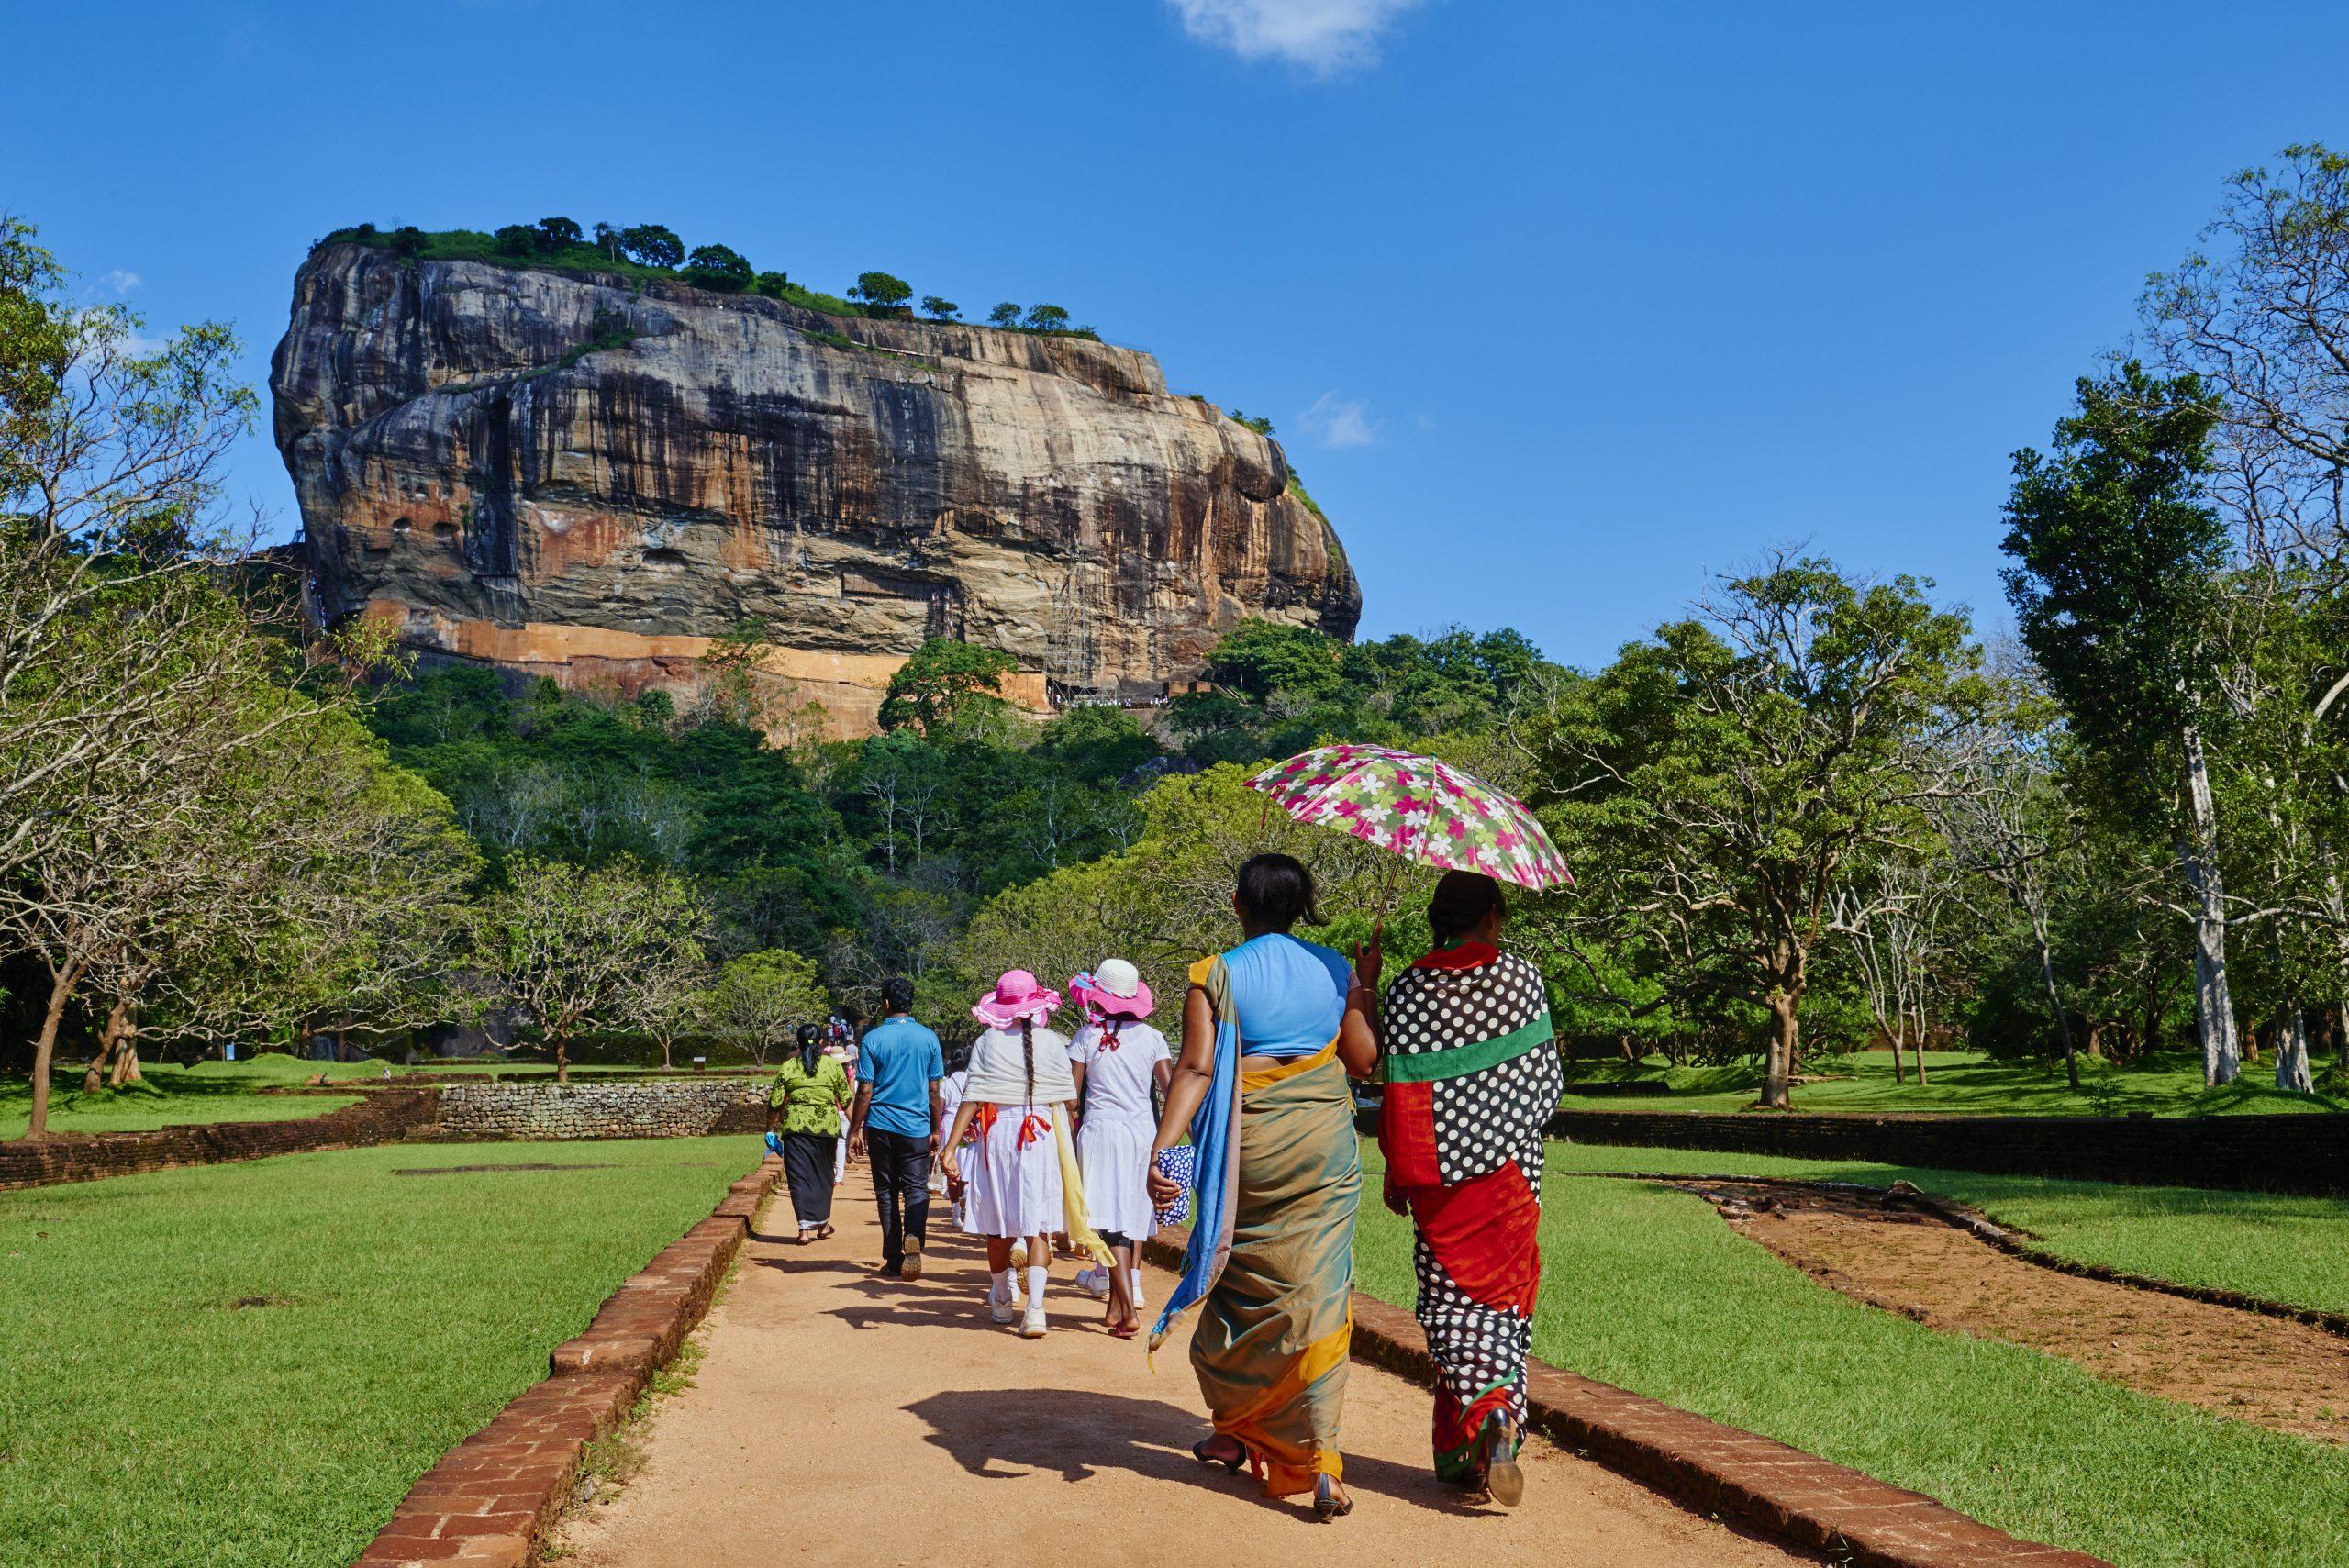 Sri Lanka, Sigiriya Lion Rock fortress